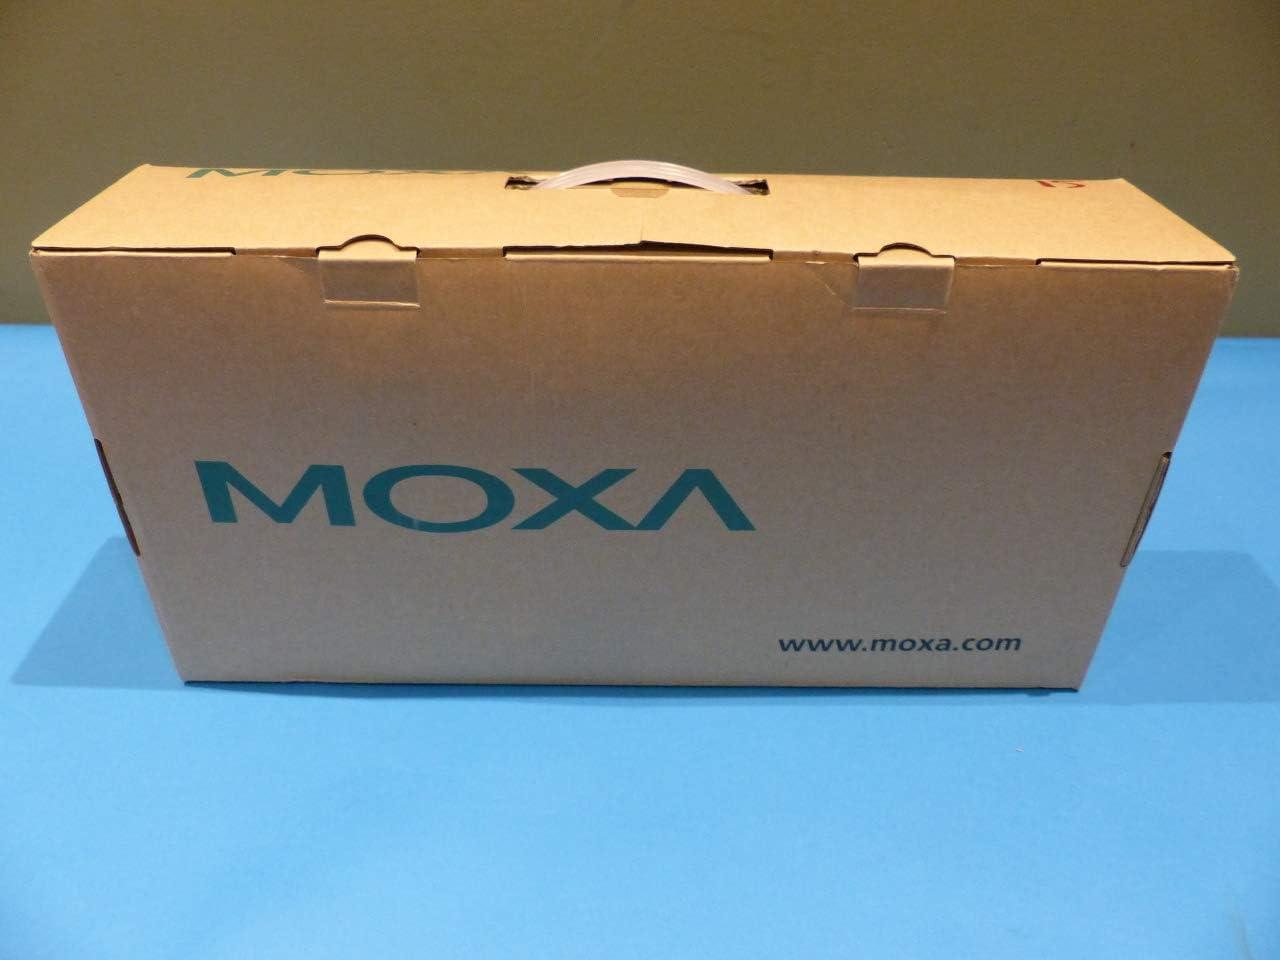 MOXA UPort Max Sale item 52% OFF 1610-16 USB to 16-Port Hub 2.0 Serial hi- RS-232